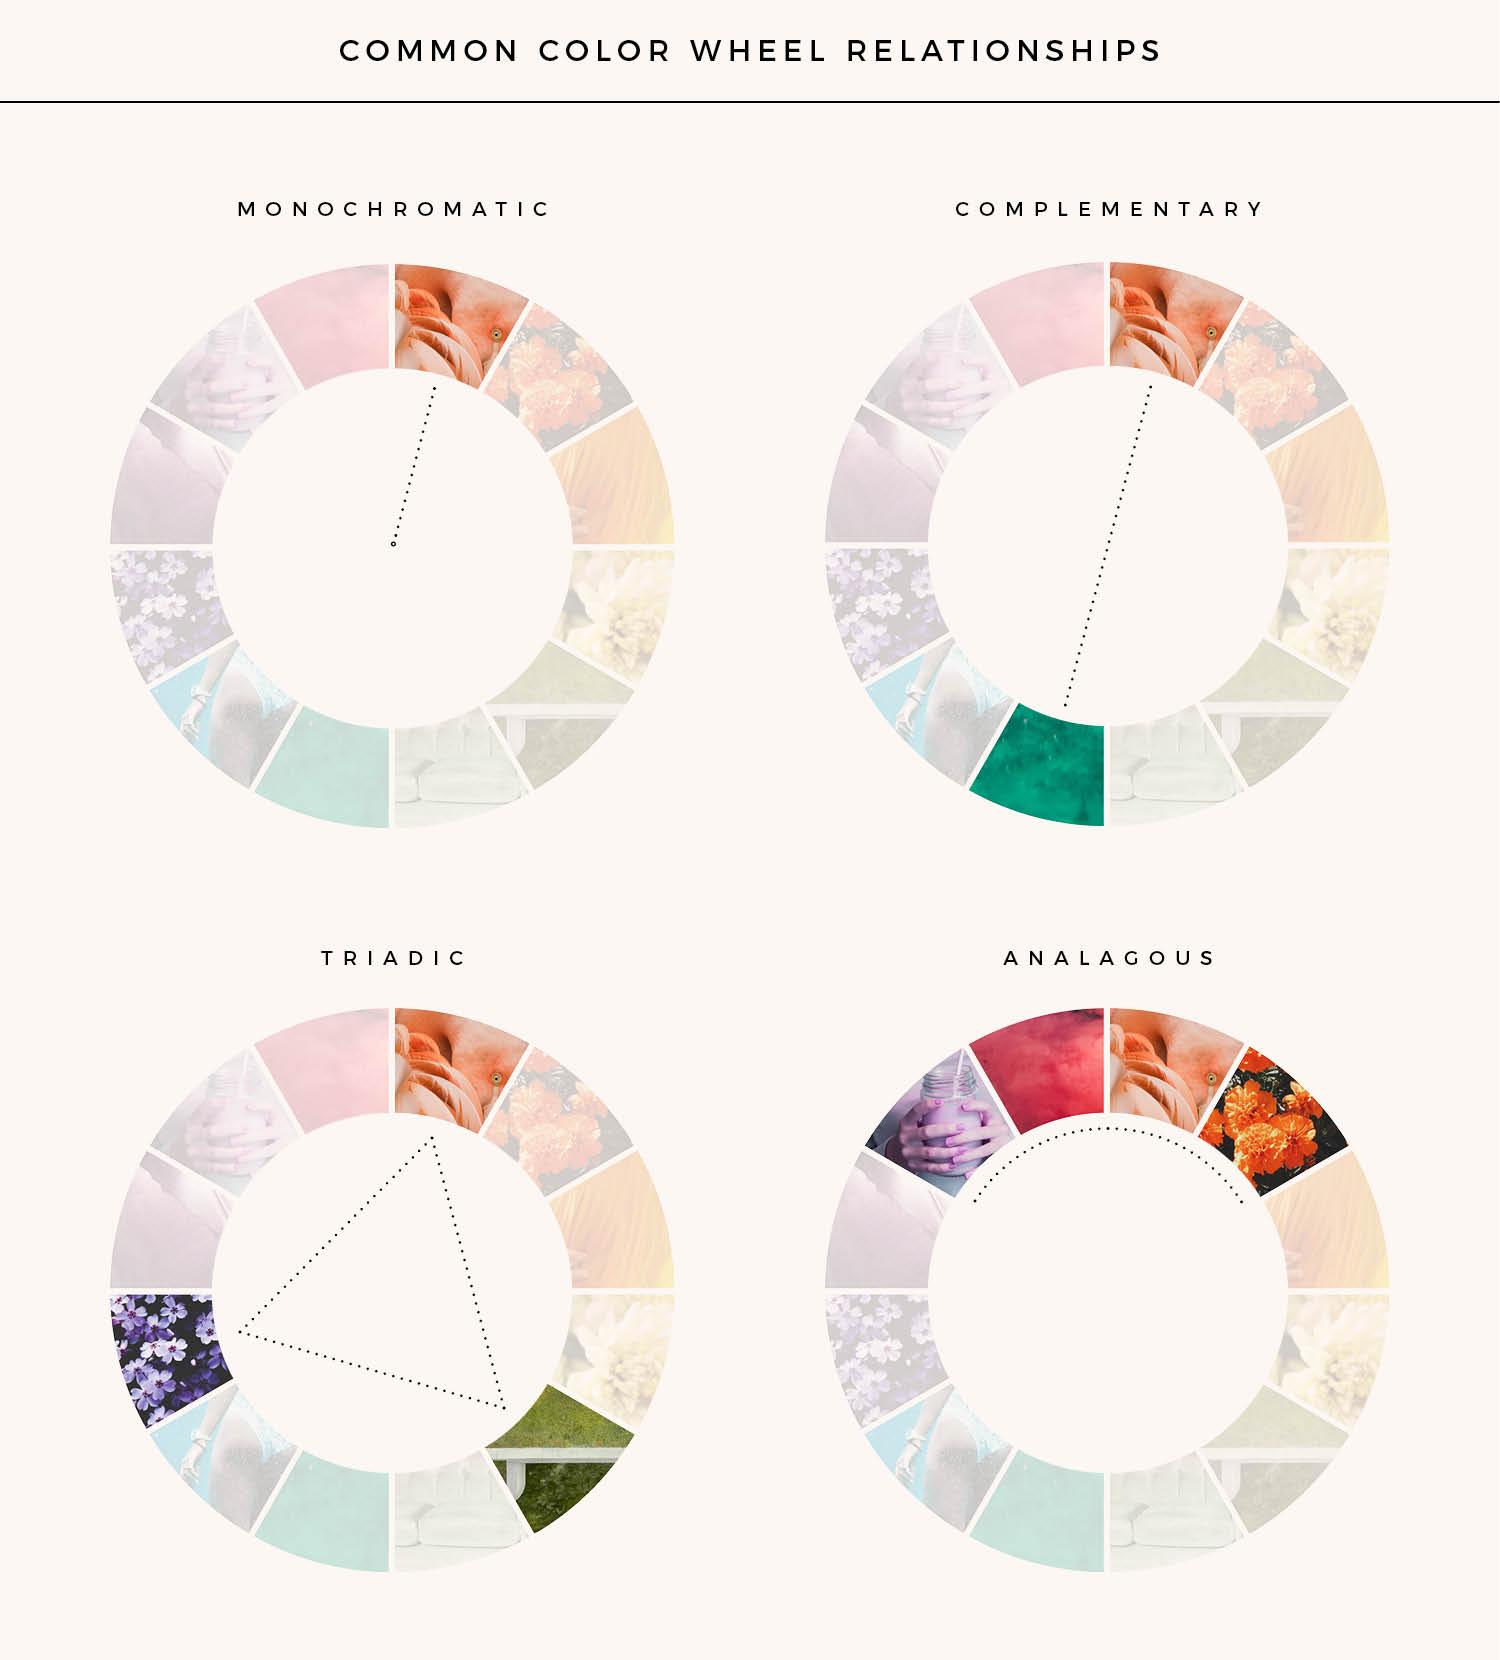 Breakdown of color wheel relationships + harmonies